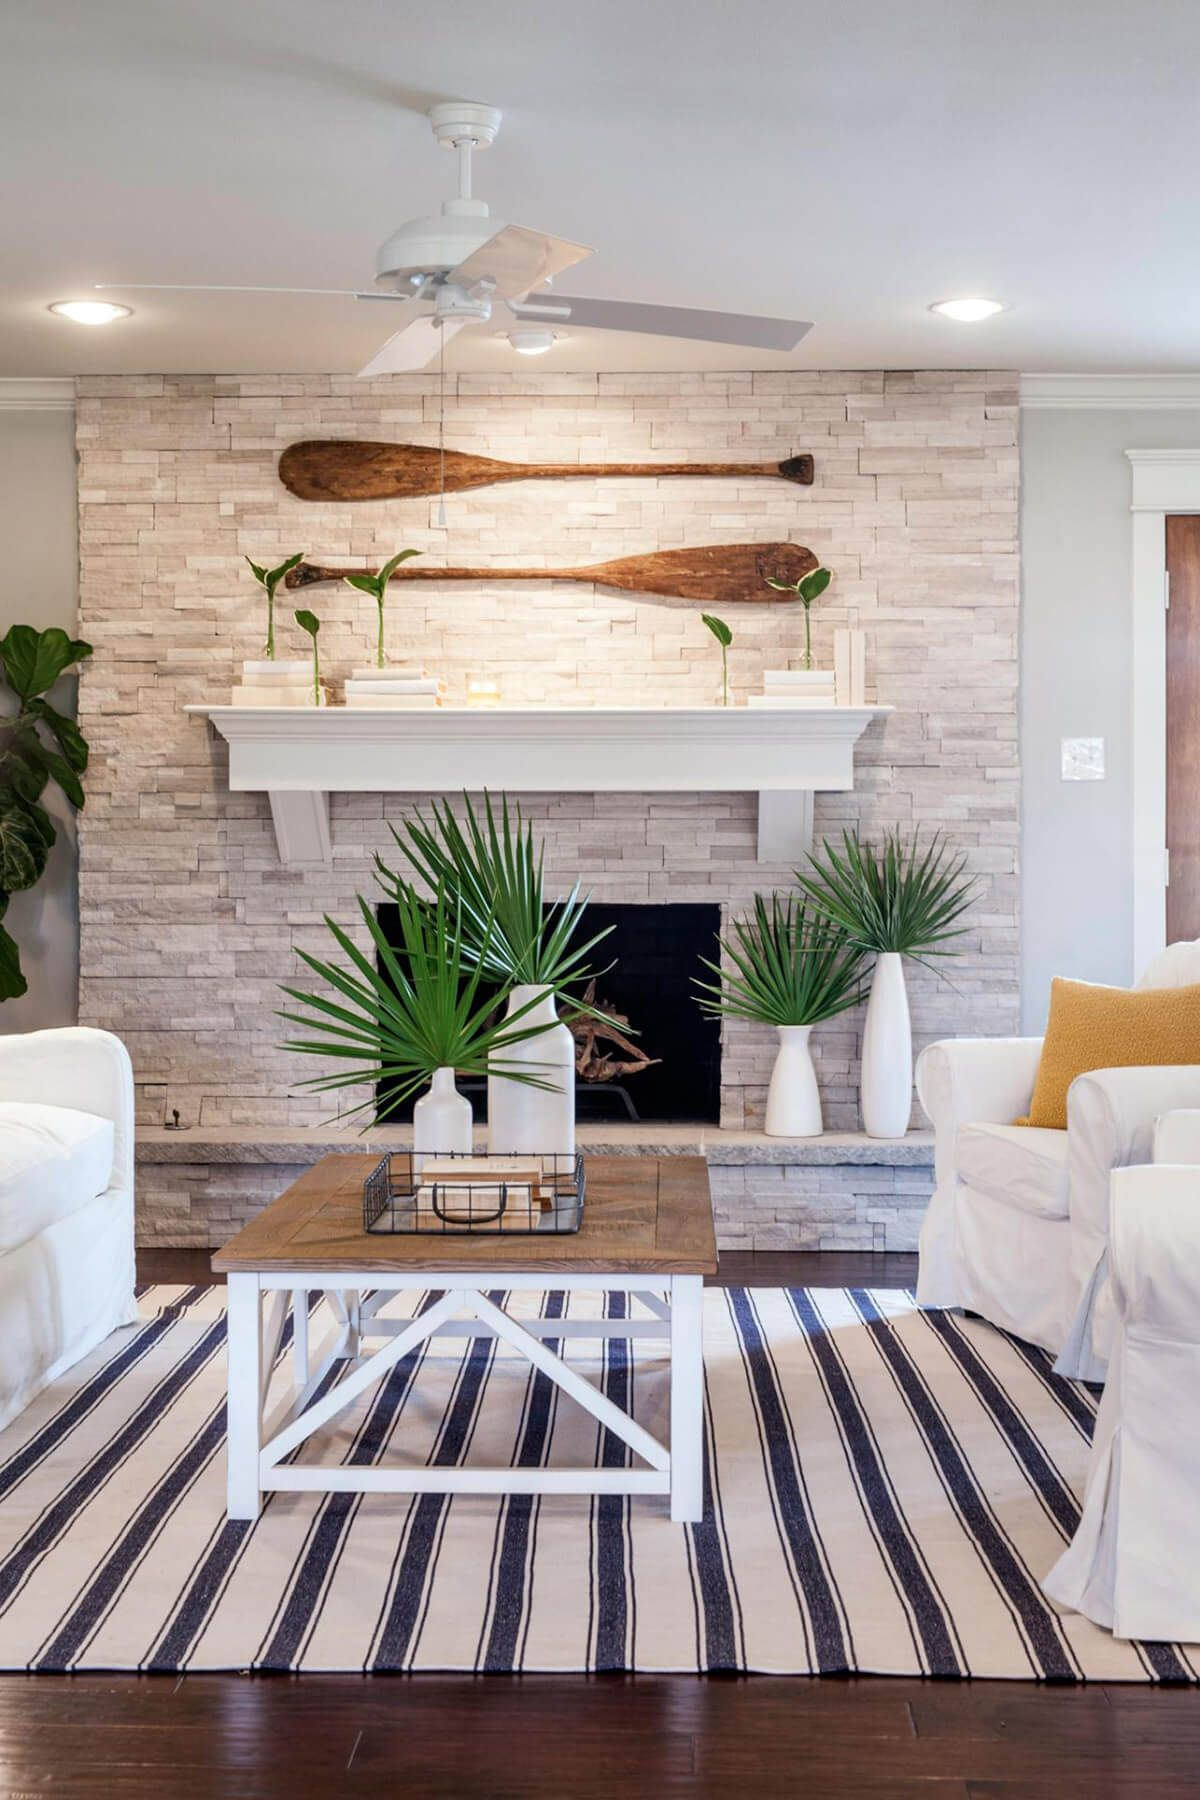 28 Coastal Decorating Ideas Living Room 2021 In 2020 Coa